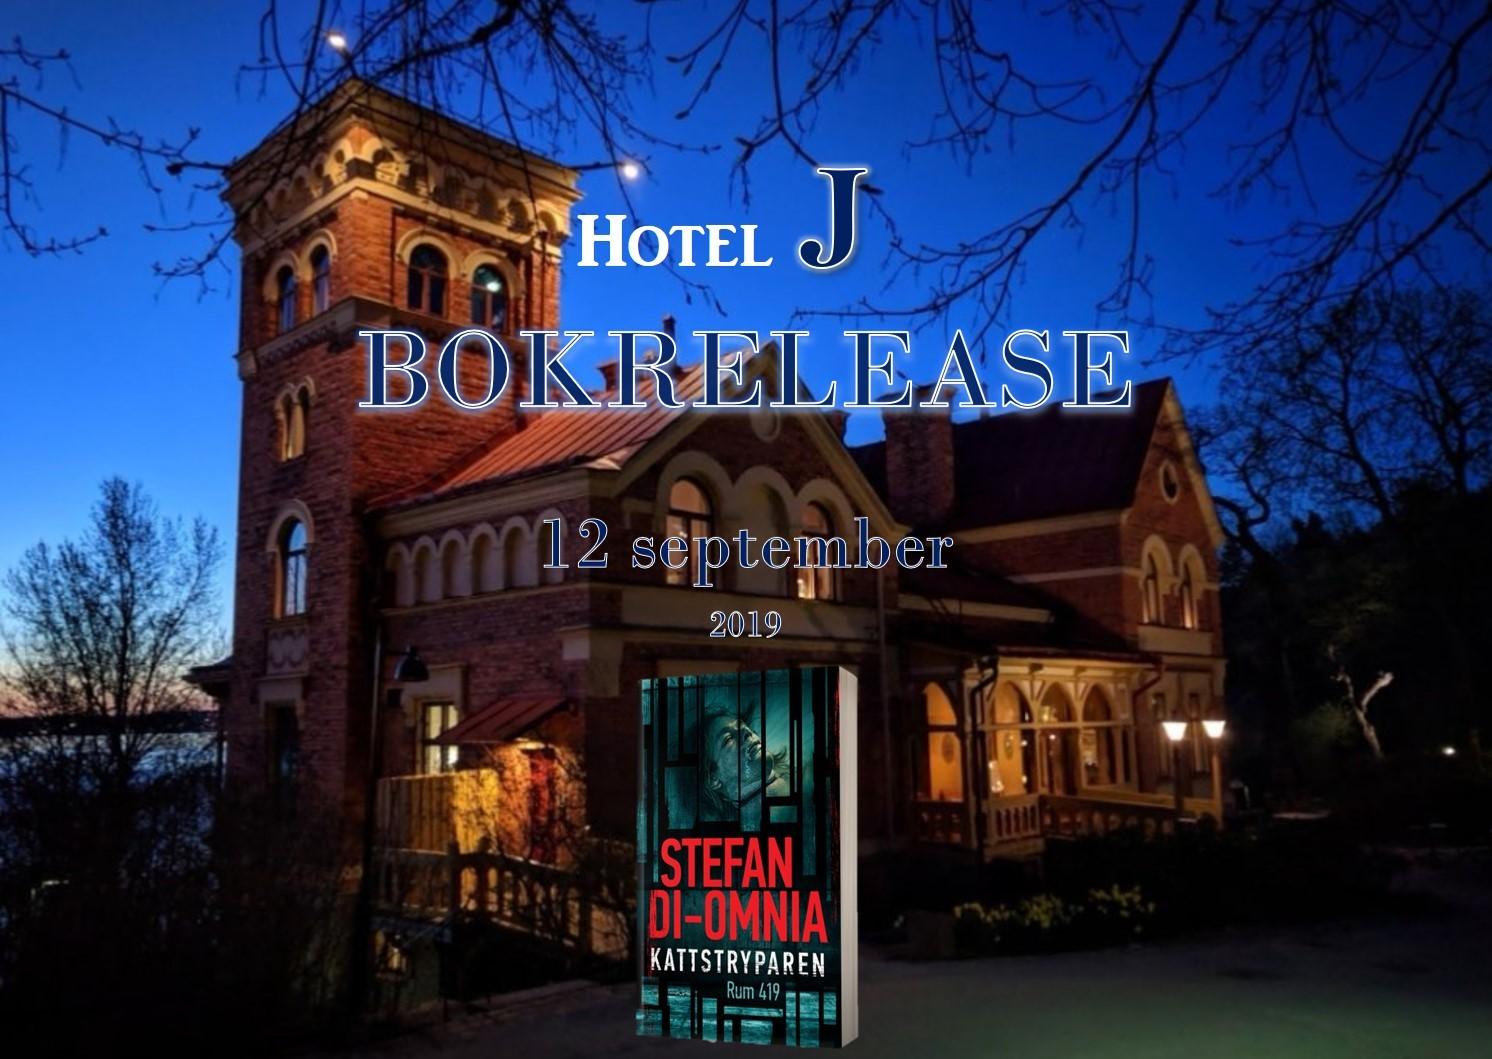 Hotel J Releasejpg